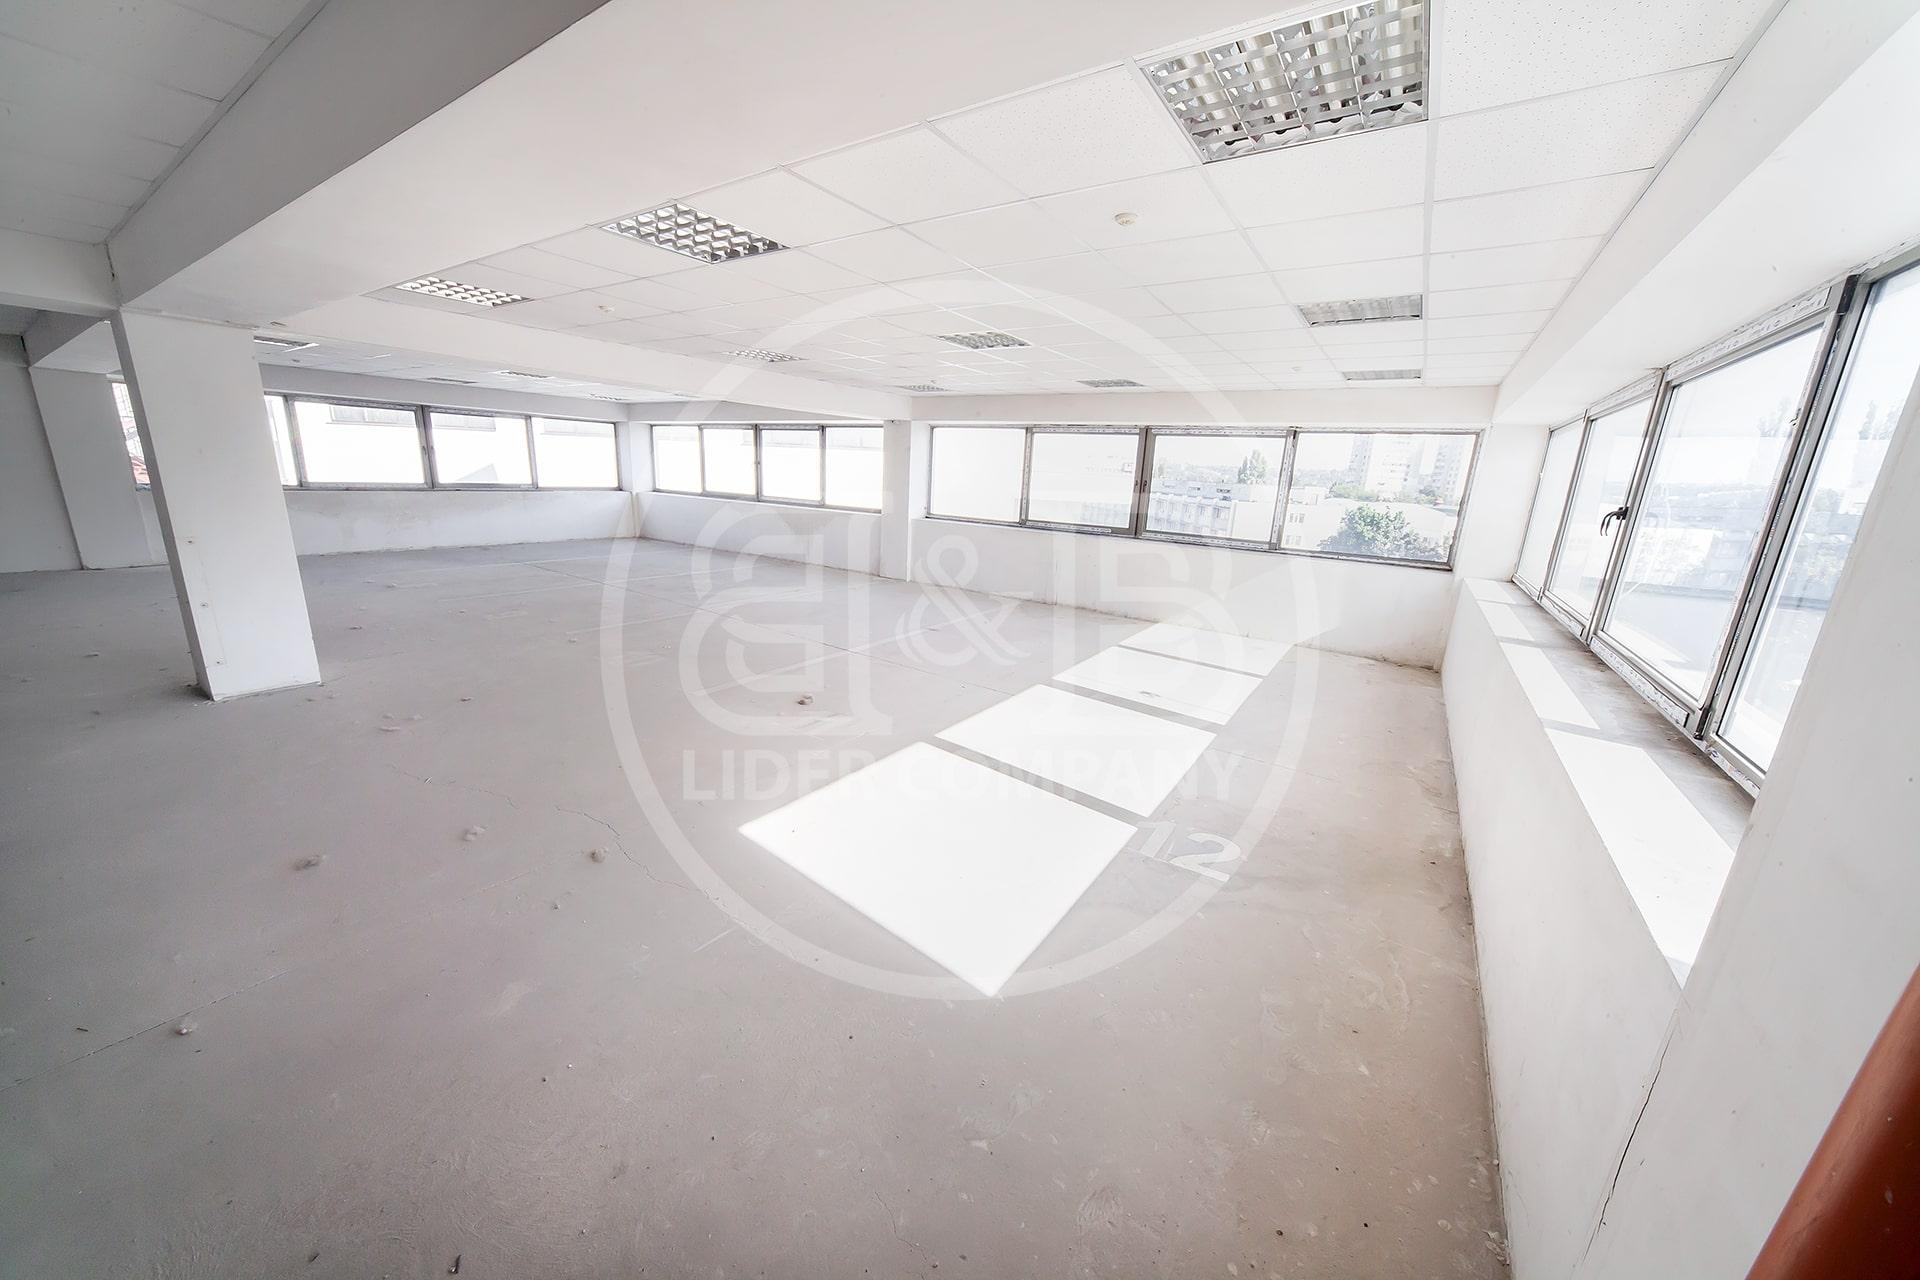 Prima linie spațiu comercial bd Decebal sectorul Botanica preț de 549 euro/m2